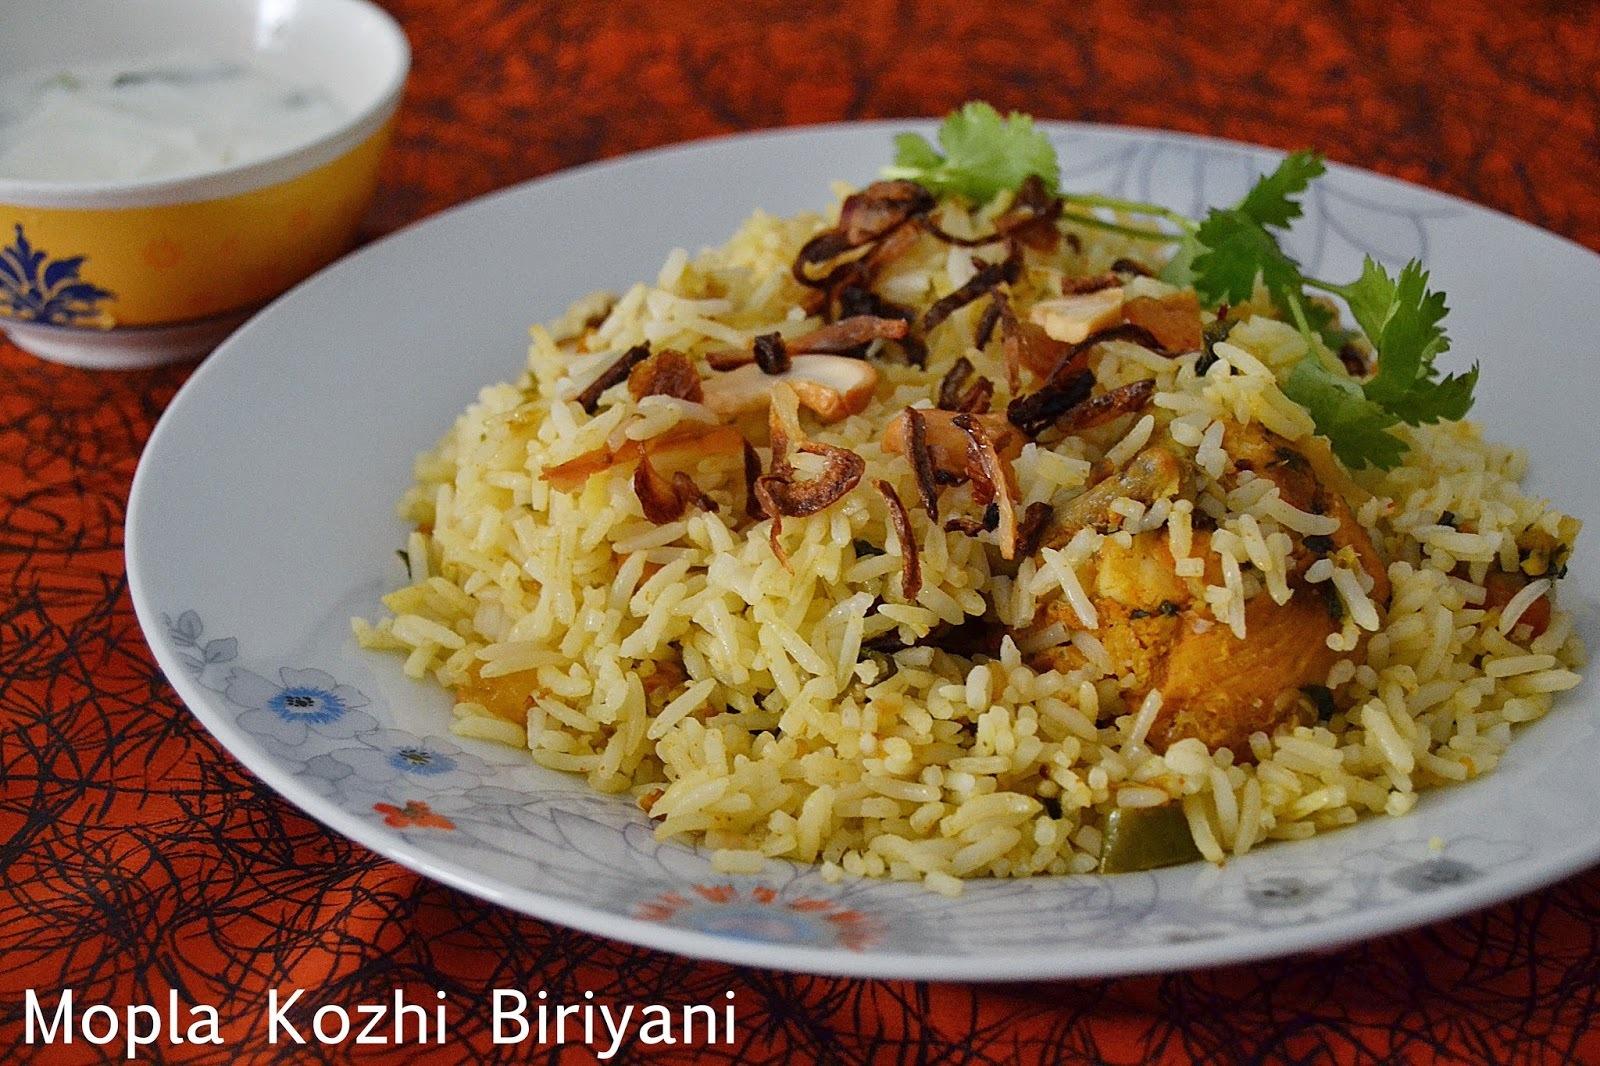 Mopla Kozhi Biriyani ~ Mappila Chicken Biriyani